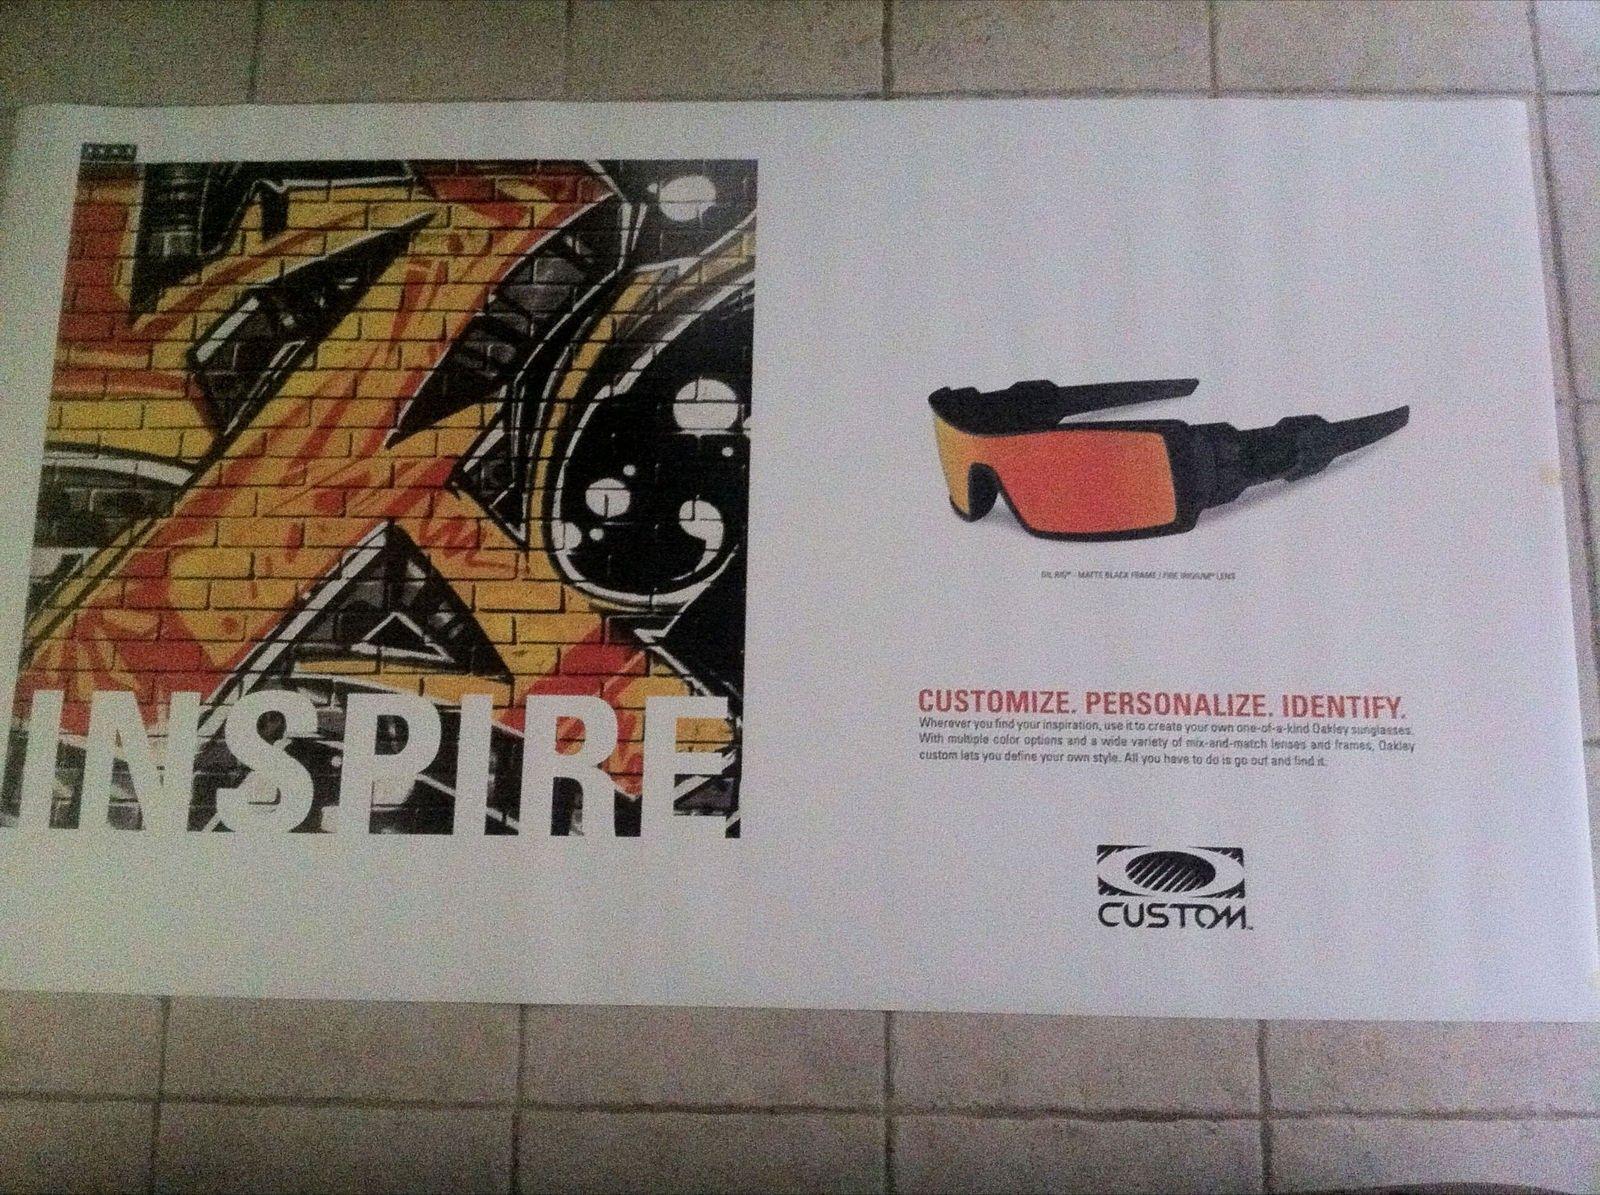 Oakley 4x7 Foot Magnetic Store Display Posters - IMG_1347.JPG